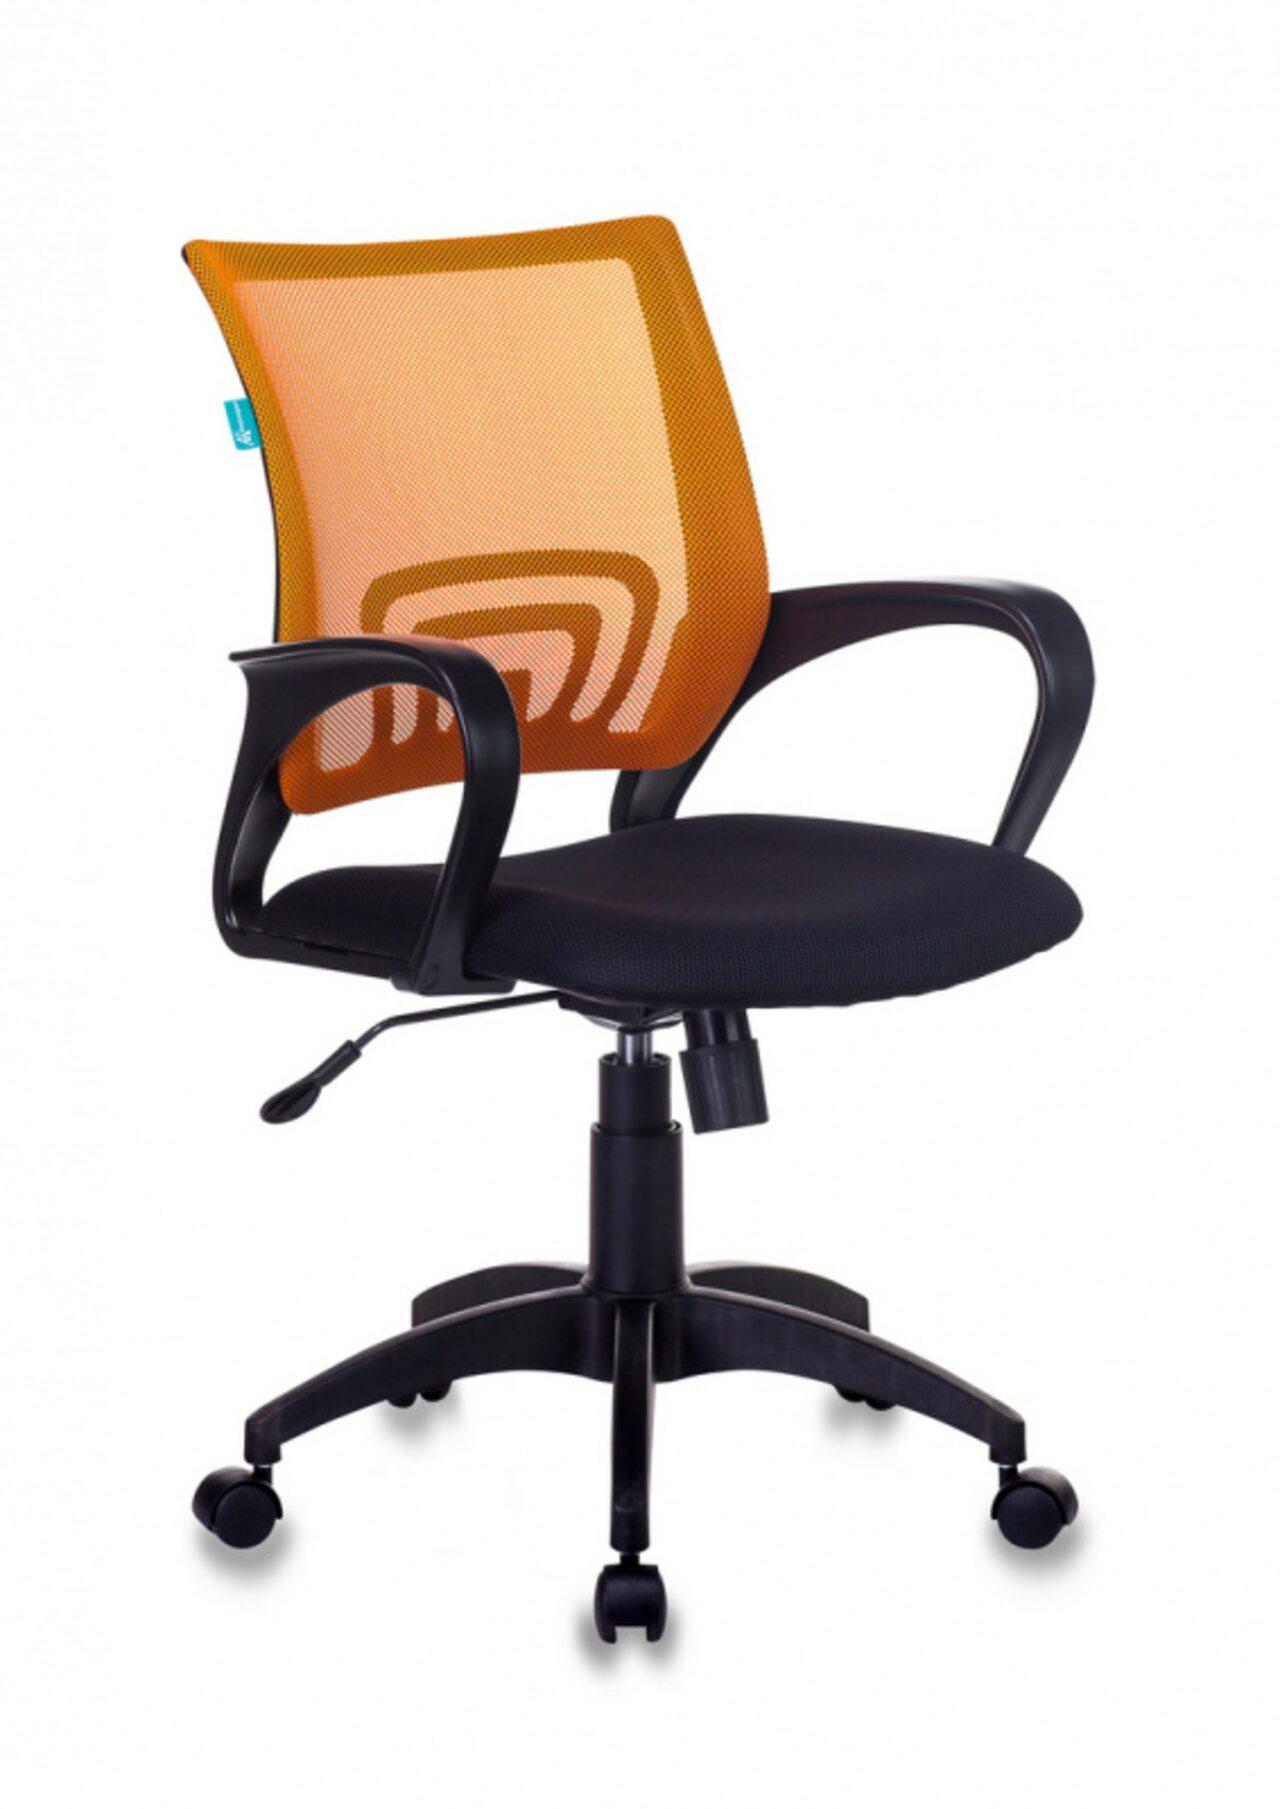 Кресло для персонала CH-695N/ - фото 4